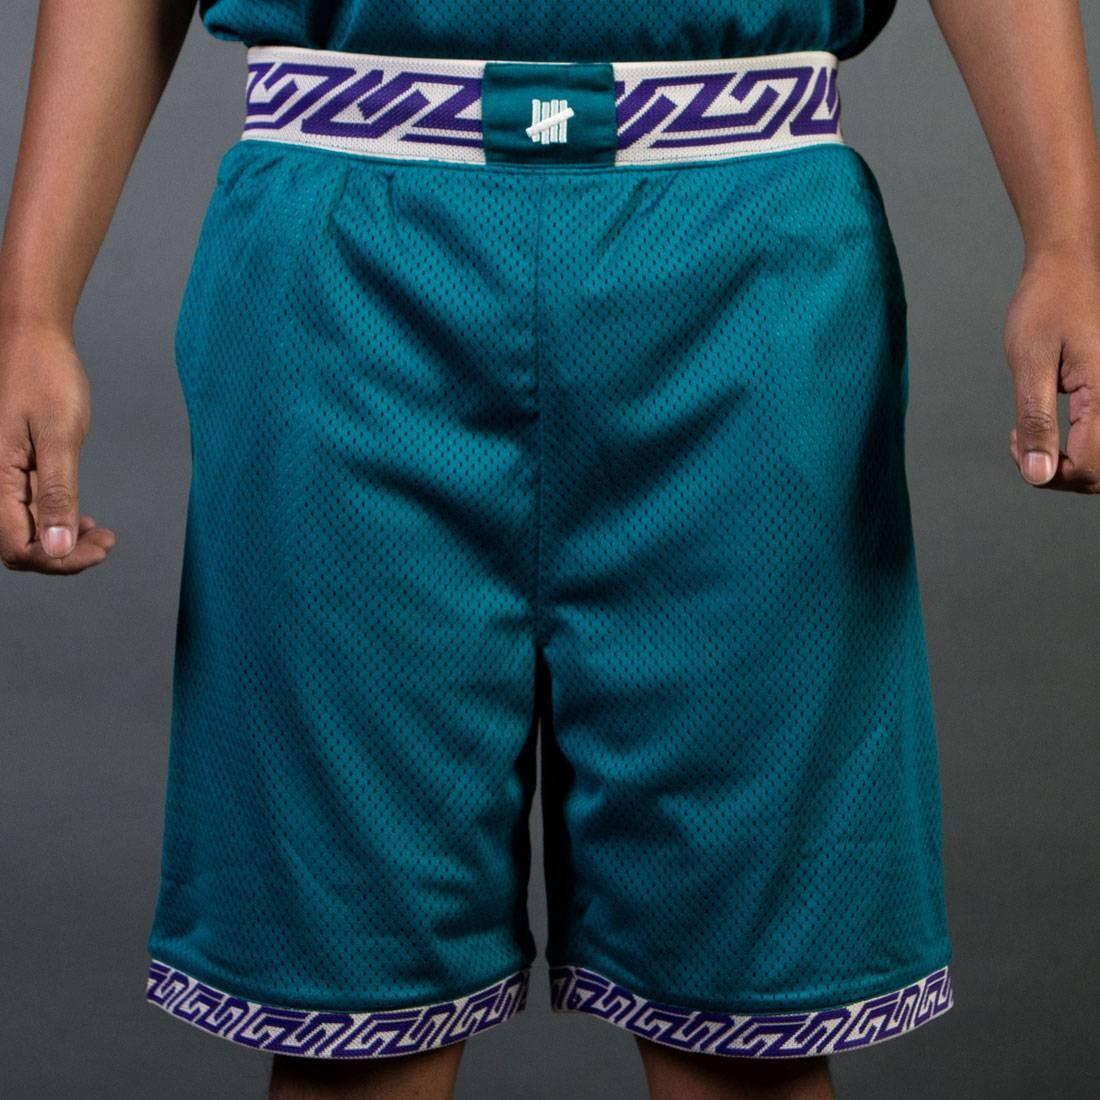 UNDEFEATED オーセンティック バスケットボール ショーツ ハーフパンツ 緑 グリーン 【 GREEN UNDEFEATED MEN AUTHENTIC BASKETBALL SHORTS TEAL 】 メンズファッション ズボン パンツ